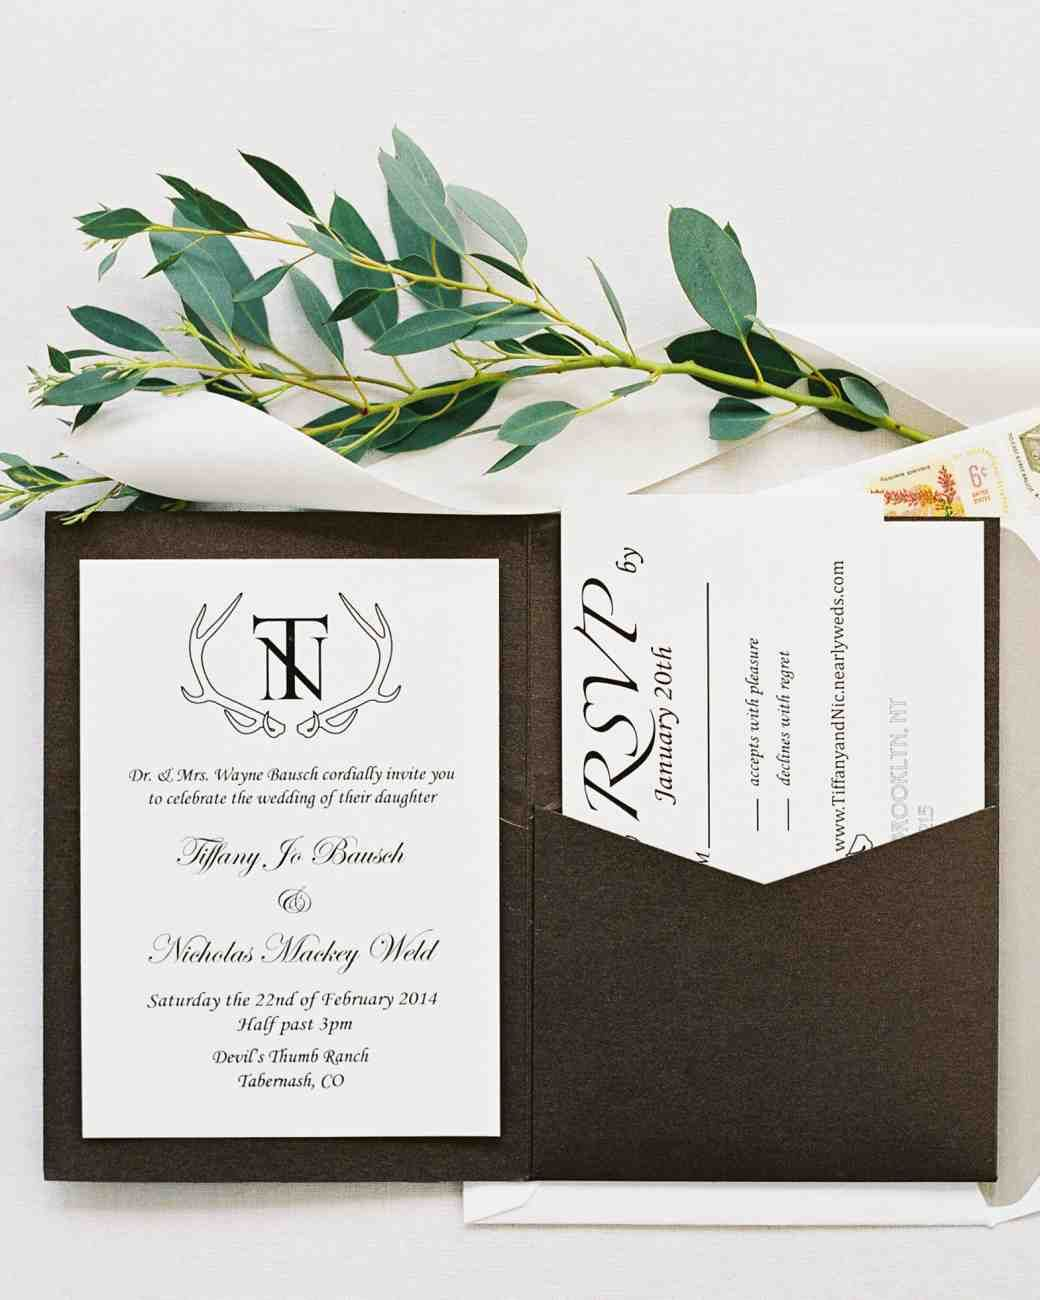 34 Unexpected Winter Wedding Invitations   February wedding, Winter ...